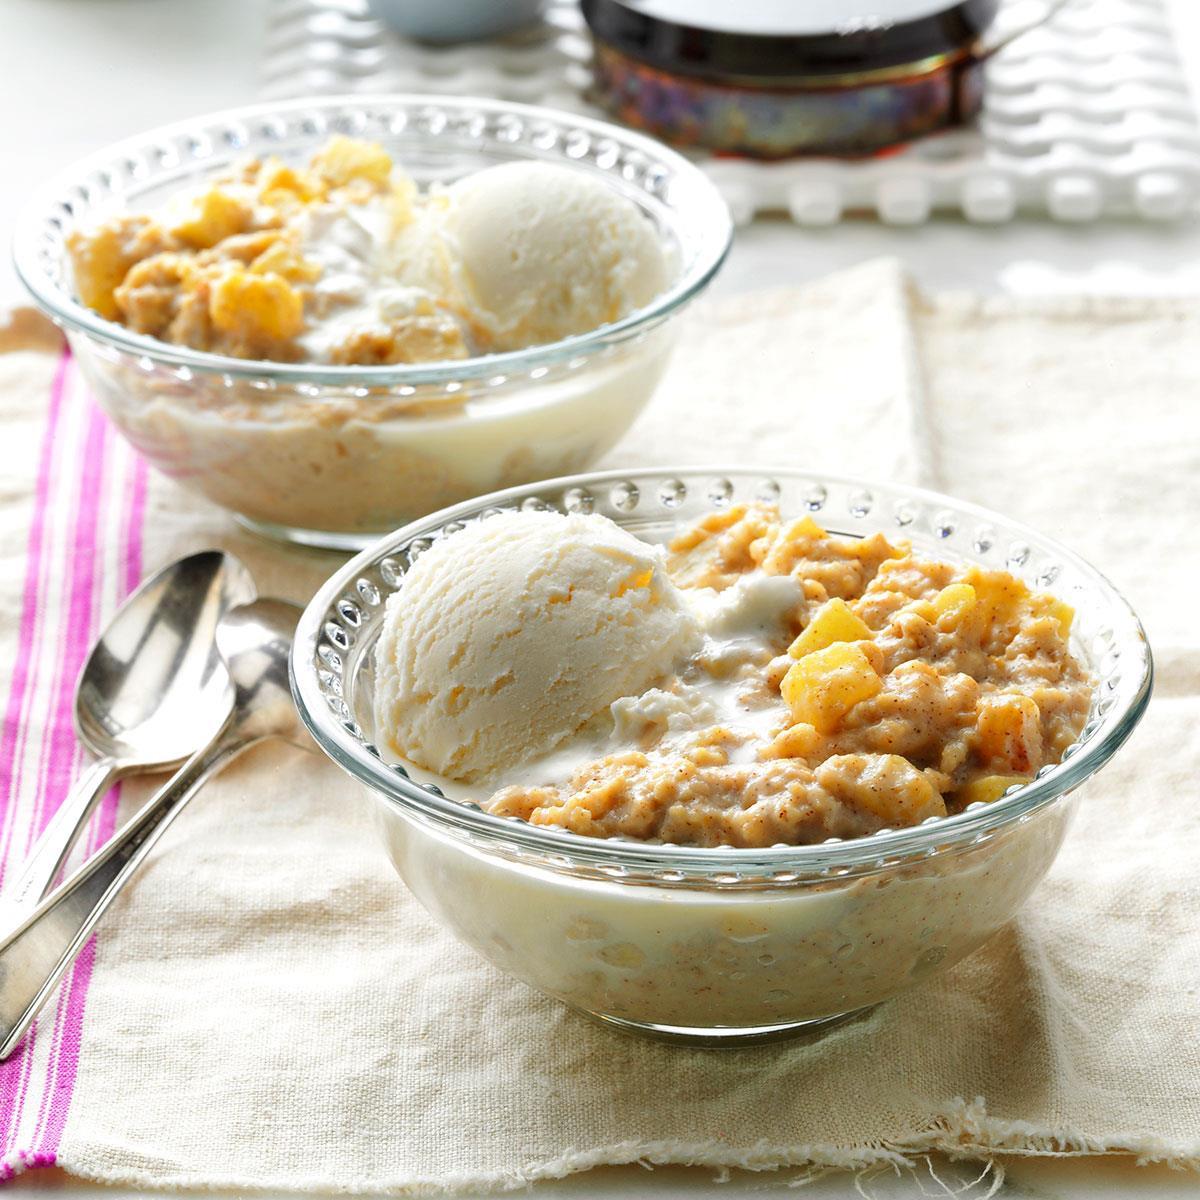 Apple Pie Dessert  Apple Pie Oatmeal Dessert Recipe